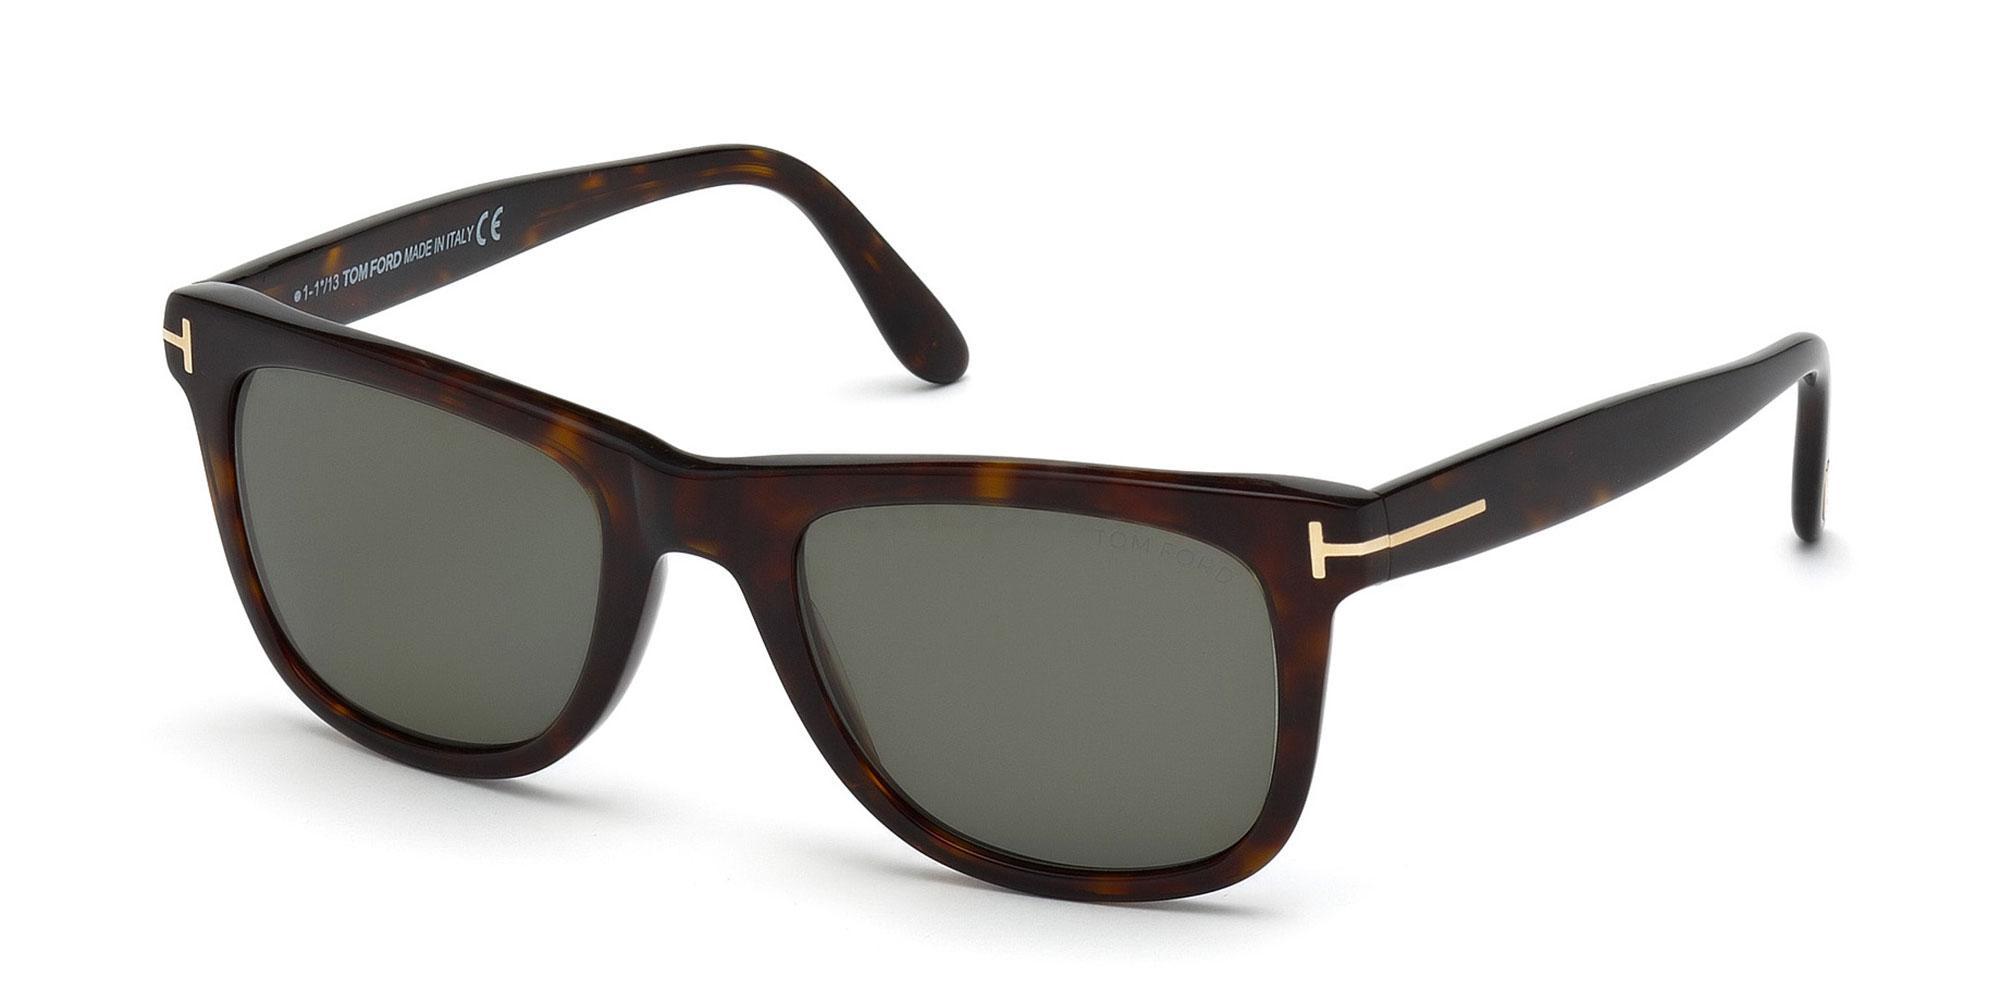 56R FT0336 LEO Sunglasses, Tom Ford